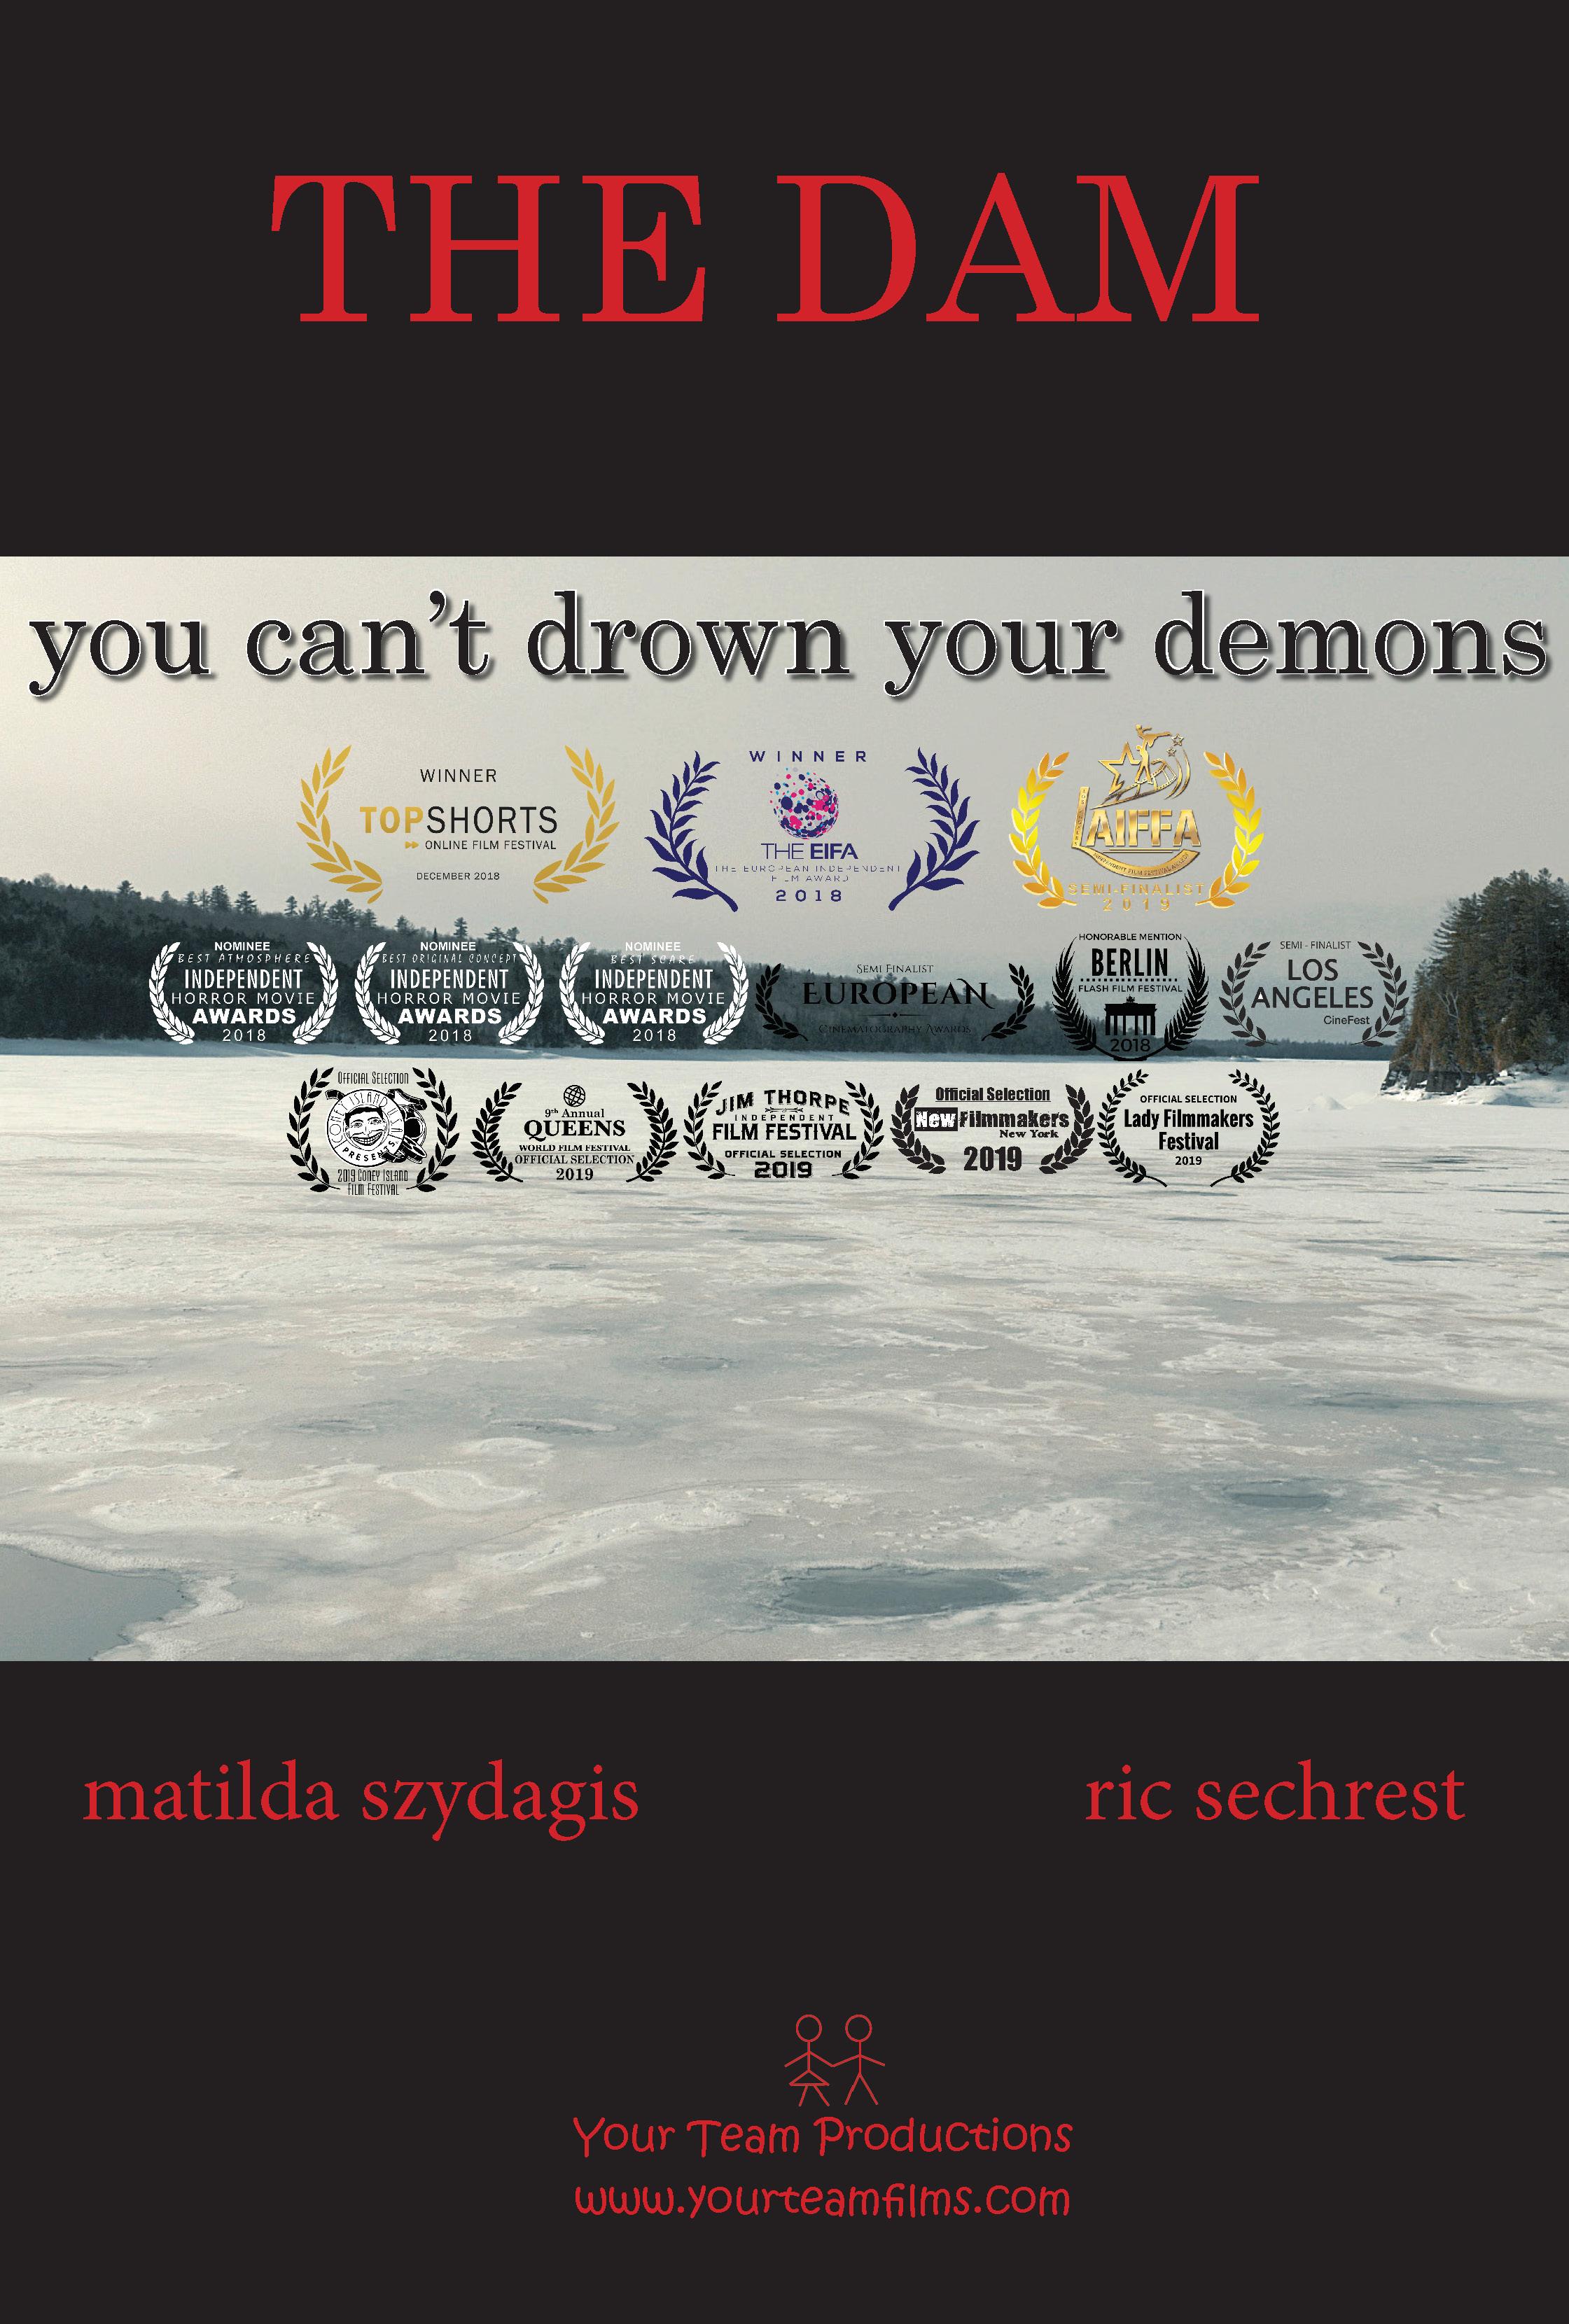 Matilda Szydagis - THE DAM_27x40_Vertical poster_with laurels.jpg